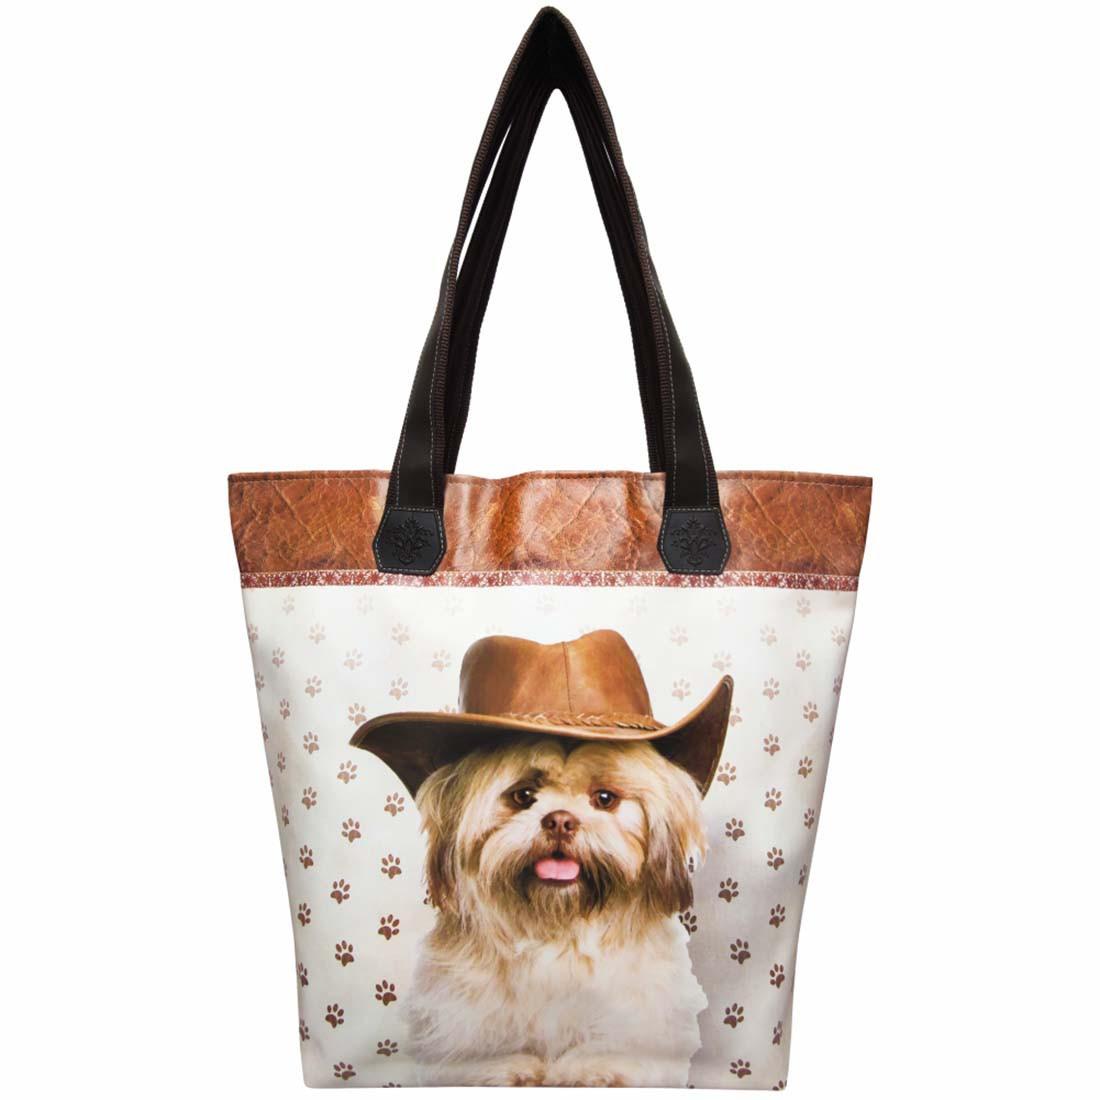 Bolsa Feminina Pet Cachorro com Chapéu, Magicc